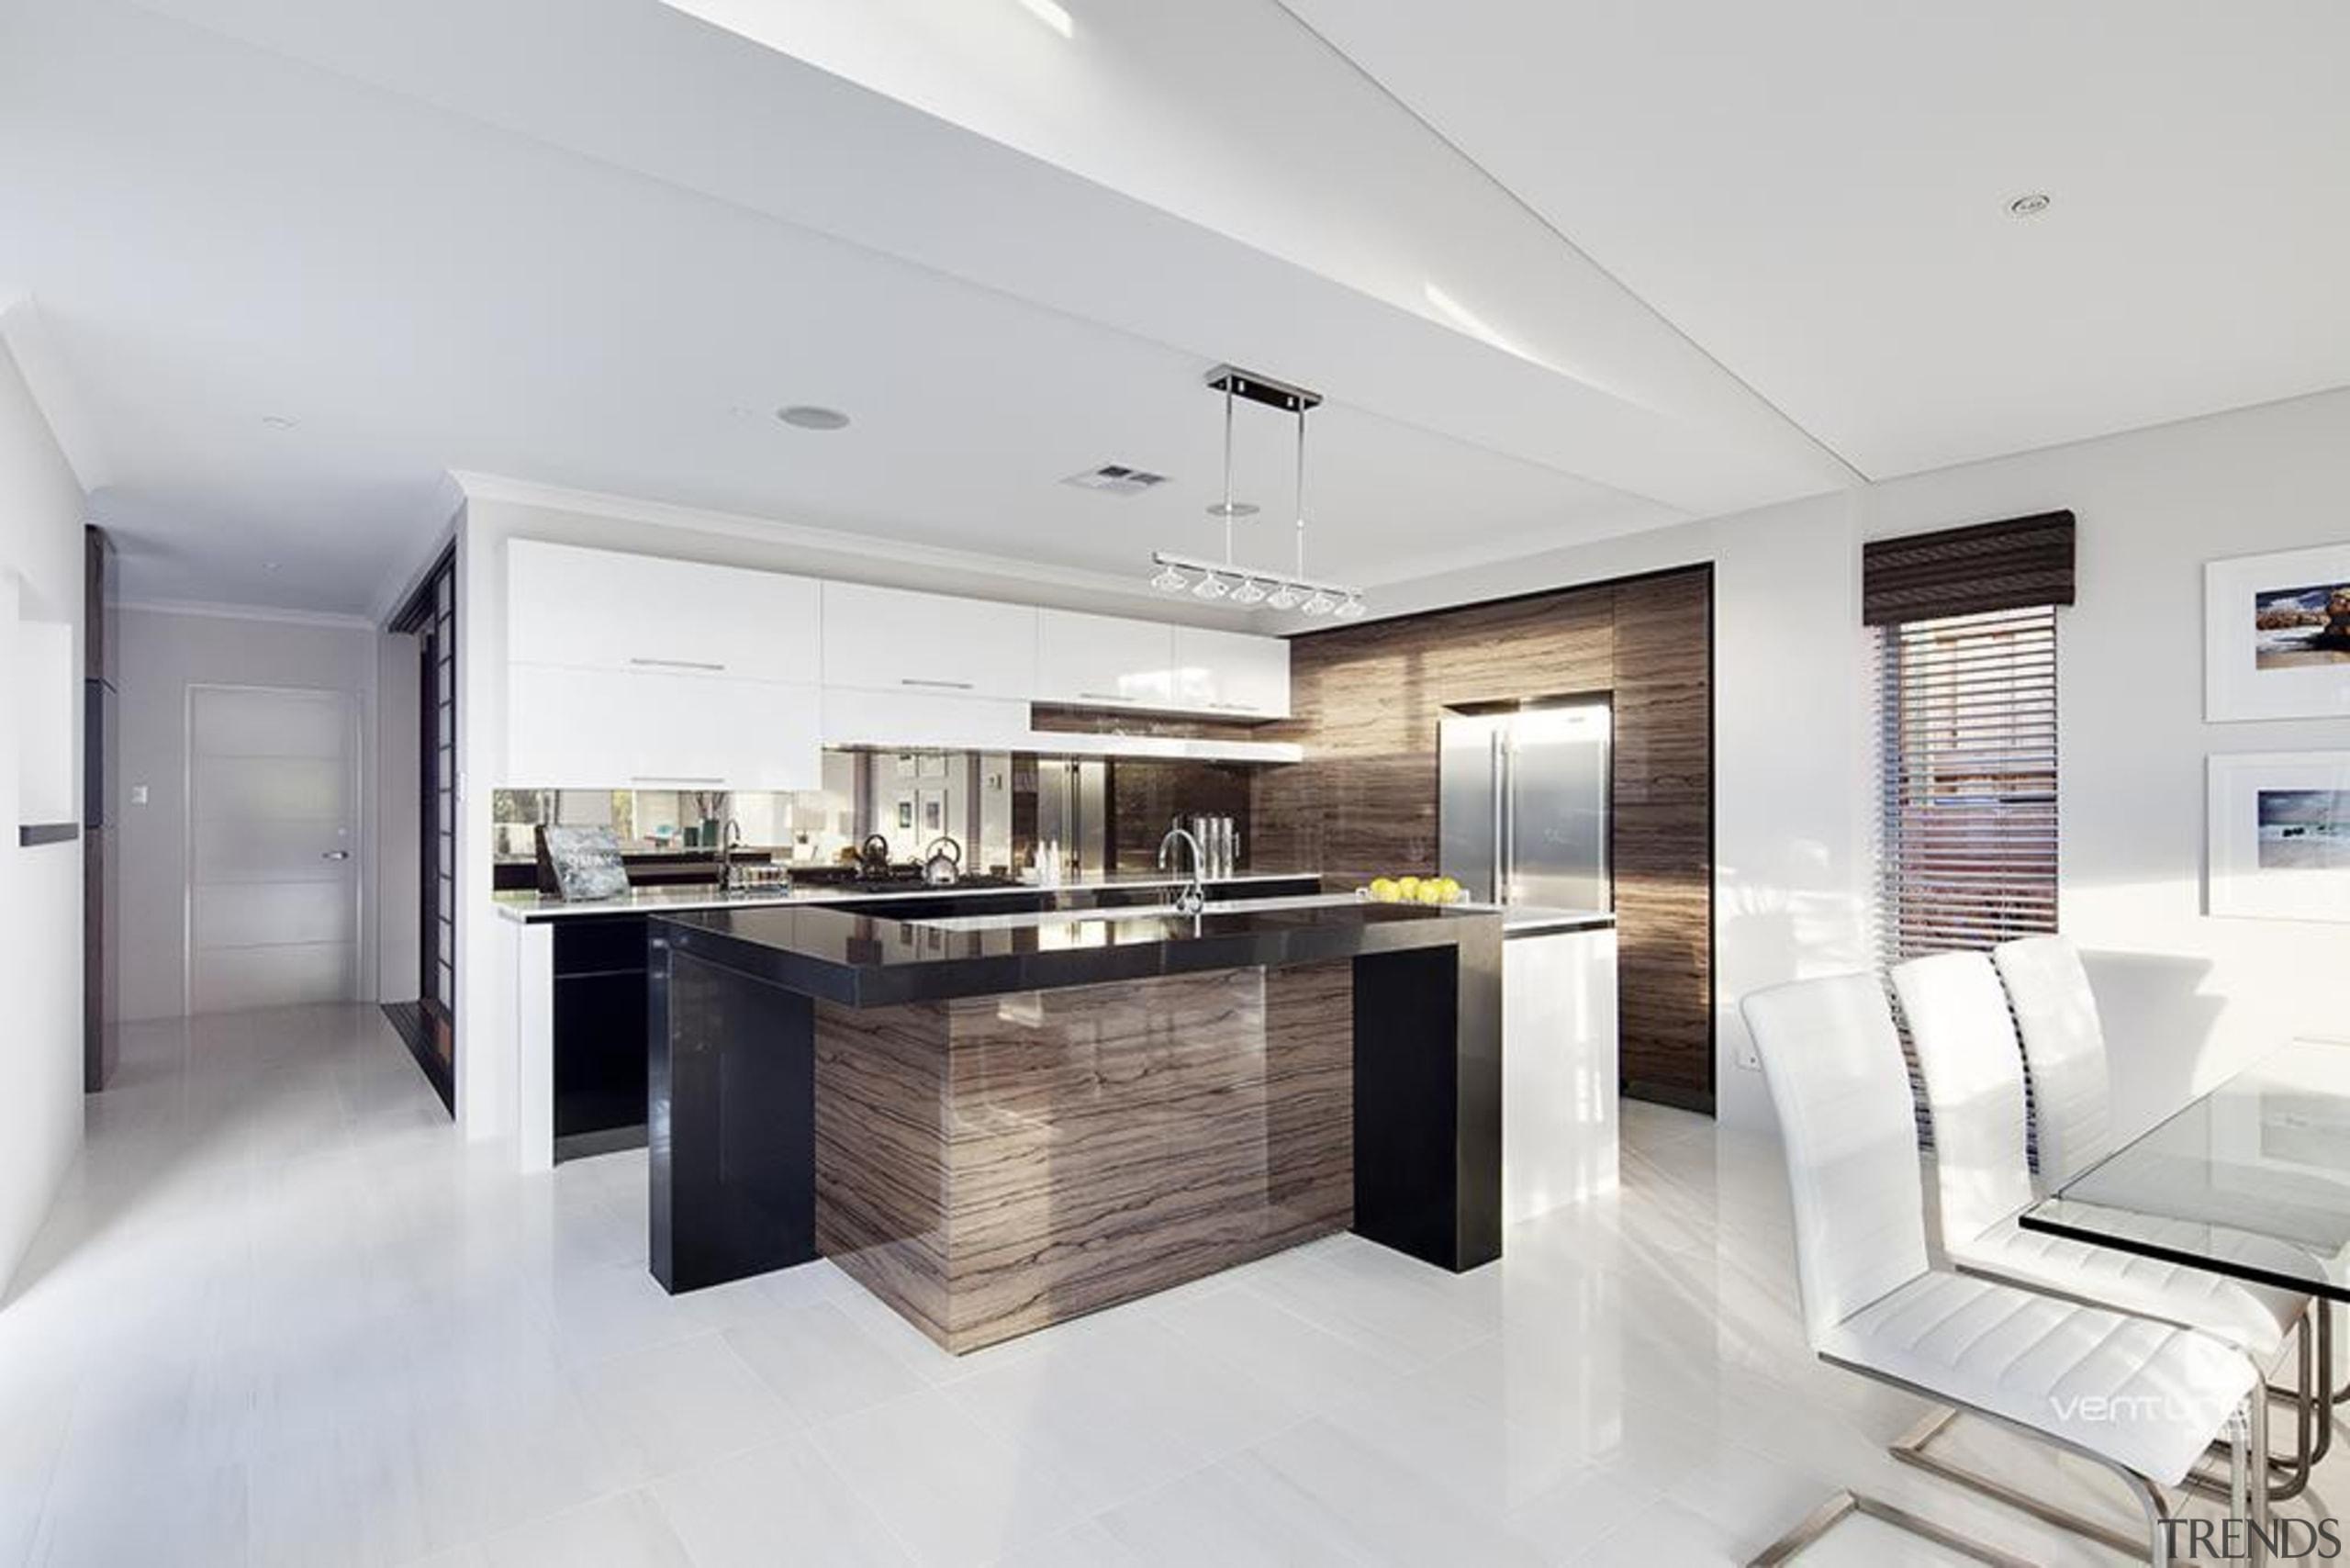 Kitchen design. - The Haven Display Home - interior design, kitchen, real estate, white